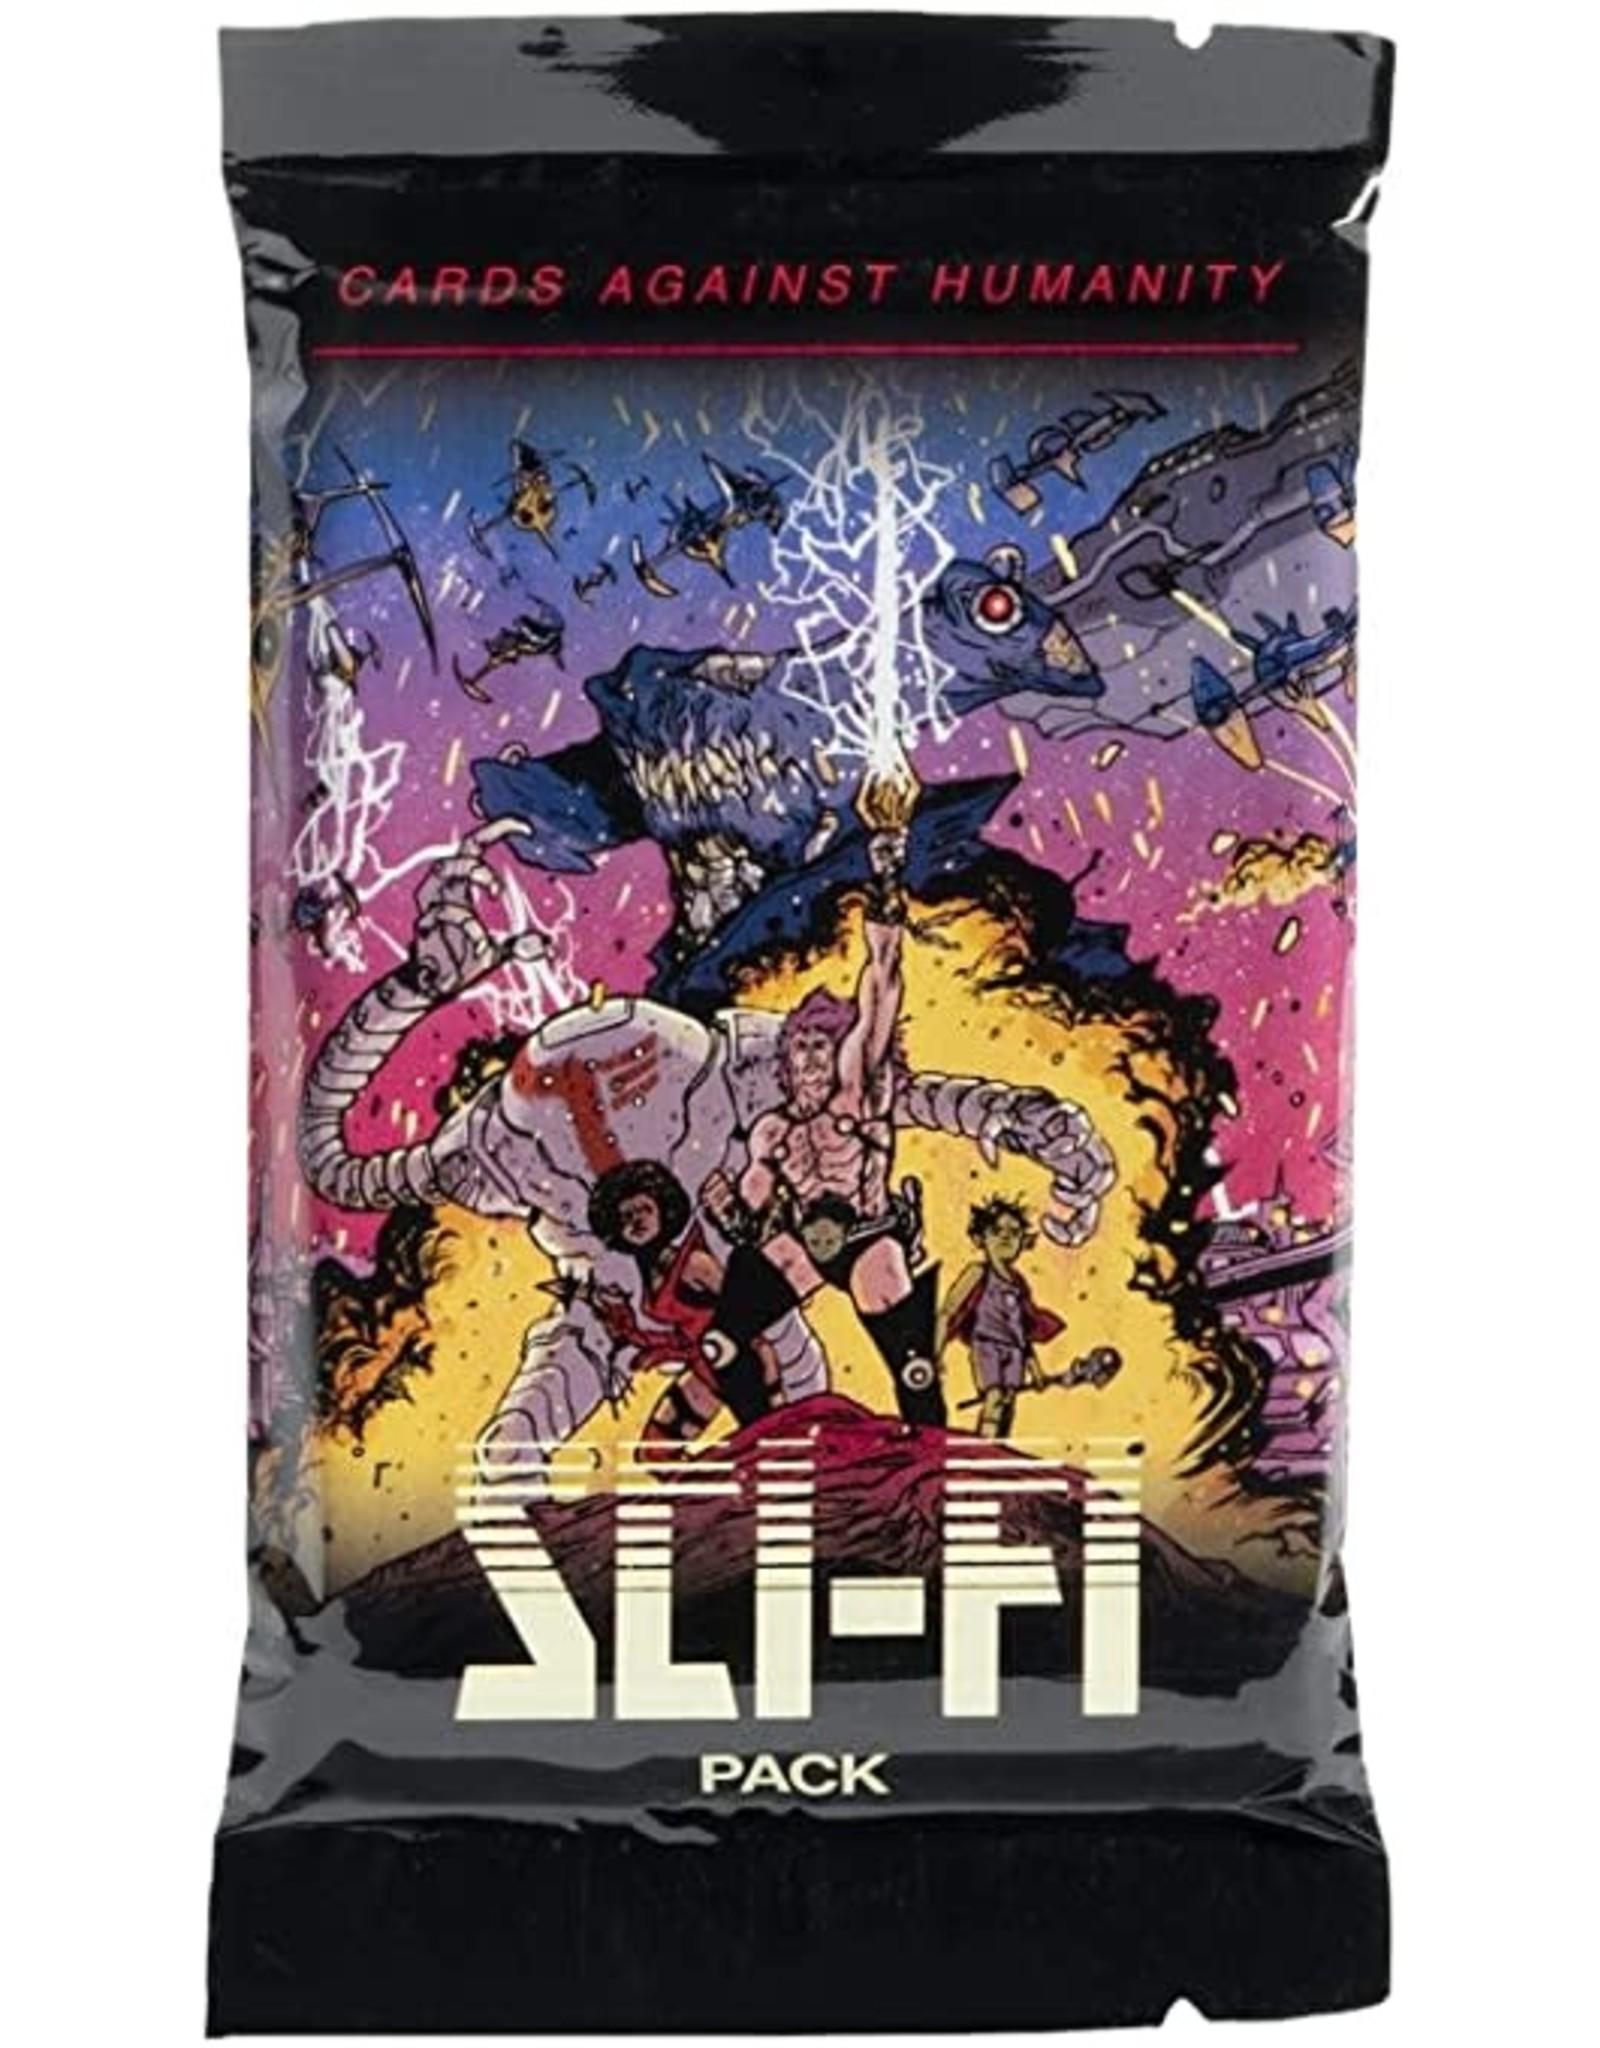 Cards Against Humanity Cards Against Humanity: Sci-Fi Pack